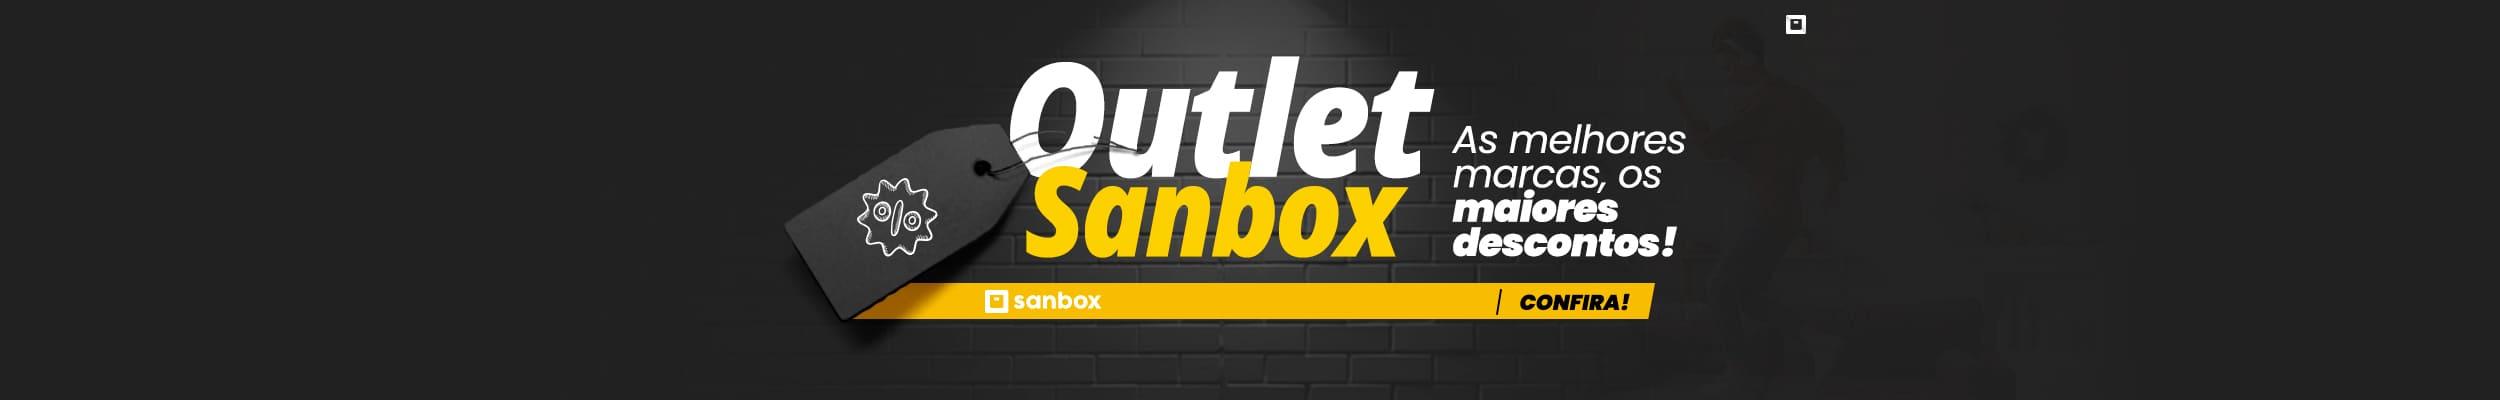 Outlet Sanbox